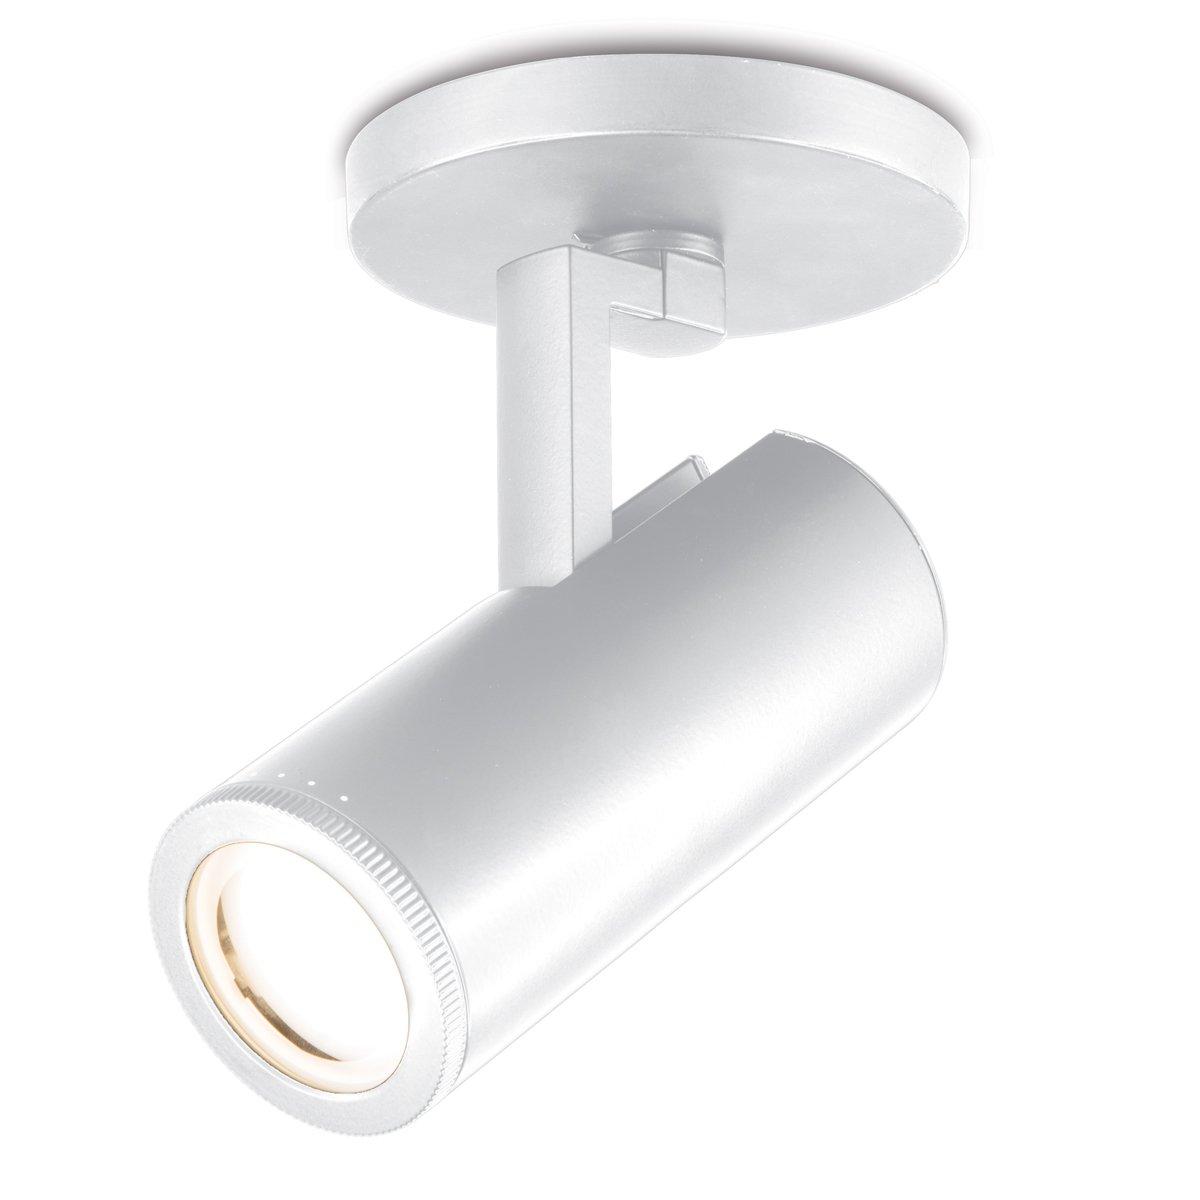 WAC Lighting Paloma MO-4023-927-WT 4023 Adjustable LED Monopoint Finish, 90+ Cri and 2700K, White by WAC Lighting